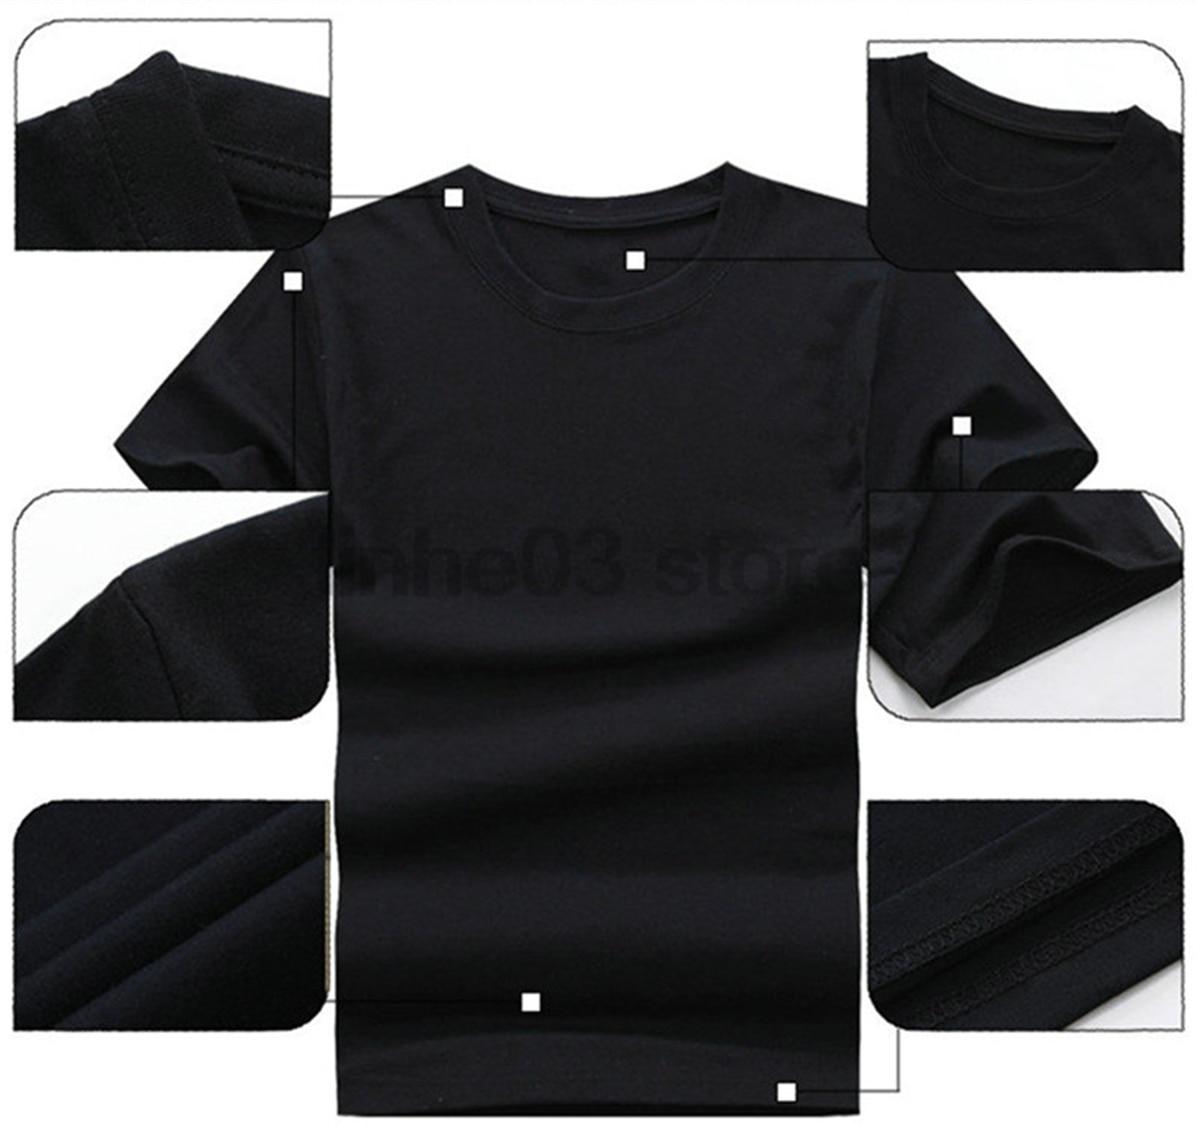 GILDAN Sleep Tight America We Got Your SIX Cover T-shirt Womens T-shirt Dress female T-shirt